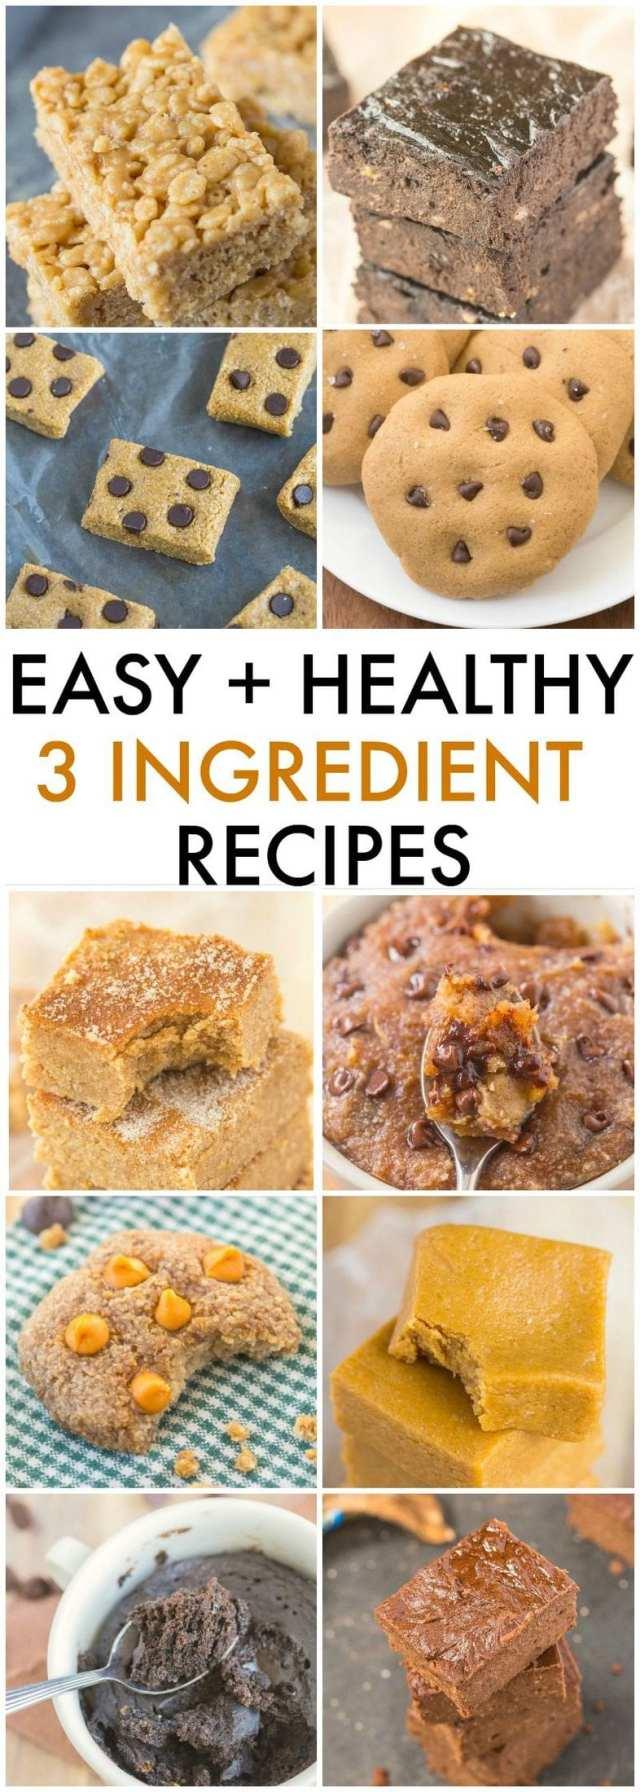 The Ultimate Easy and Healthy Recipes using just THREE ingredients- No nasties, no boxed mixes, nada- 100% delicious! {vegan, gluten free, paleo recipes}- thebigmansworld.com